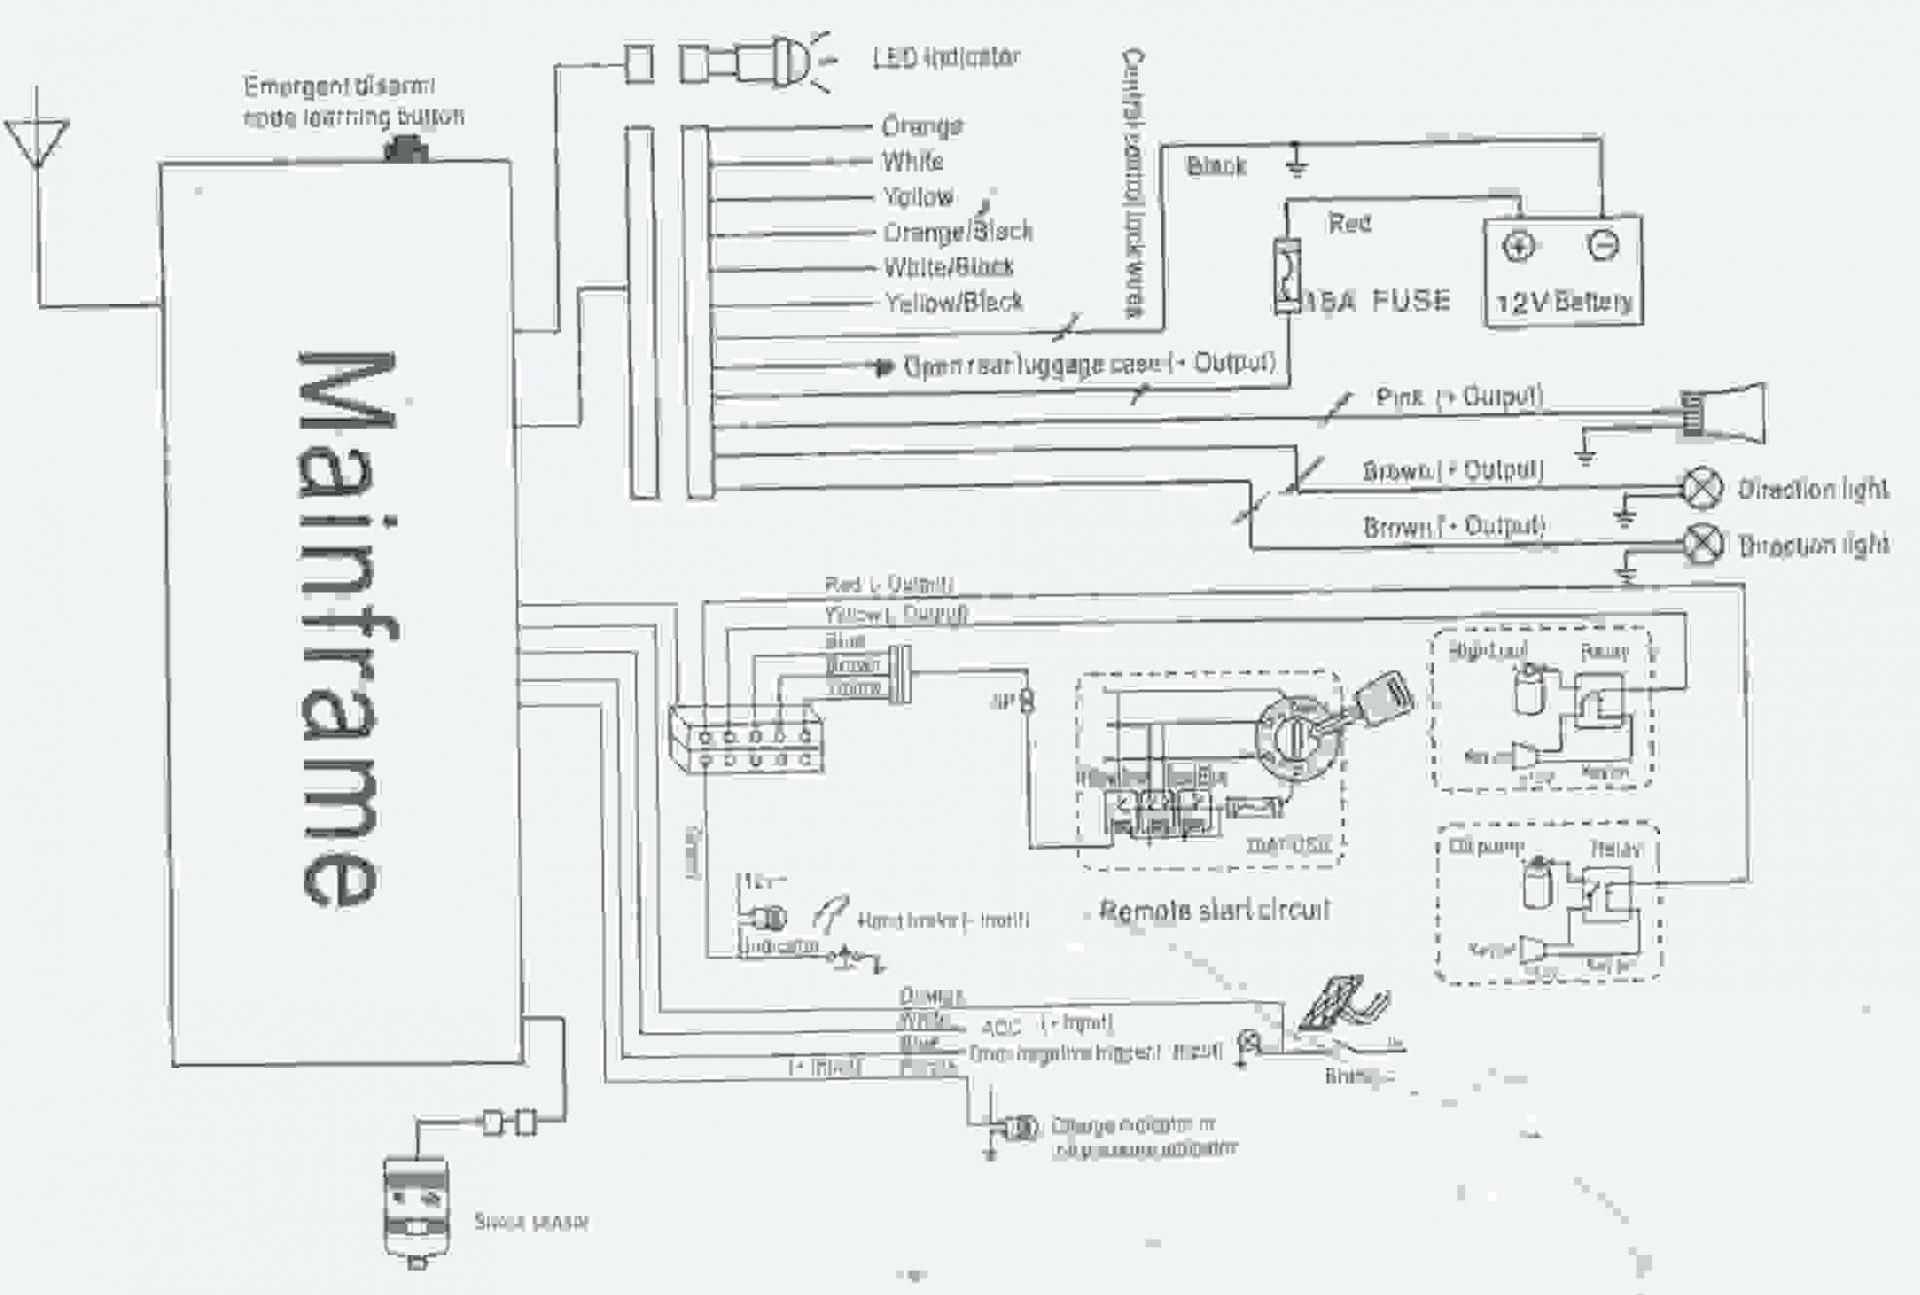 DIAGRAM] Rhino Gts Car Alarm Wiring Diagram - Ford Electronic Ignition Coil Wiring  Diagram 1987 List harbor.mon1erinstrument.frmon1erinstrument.fr